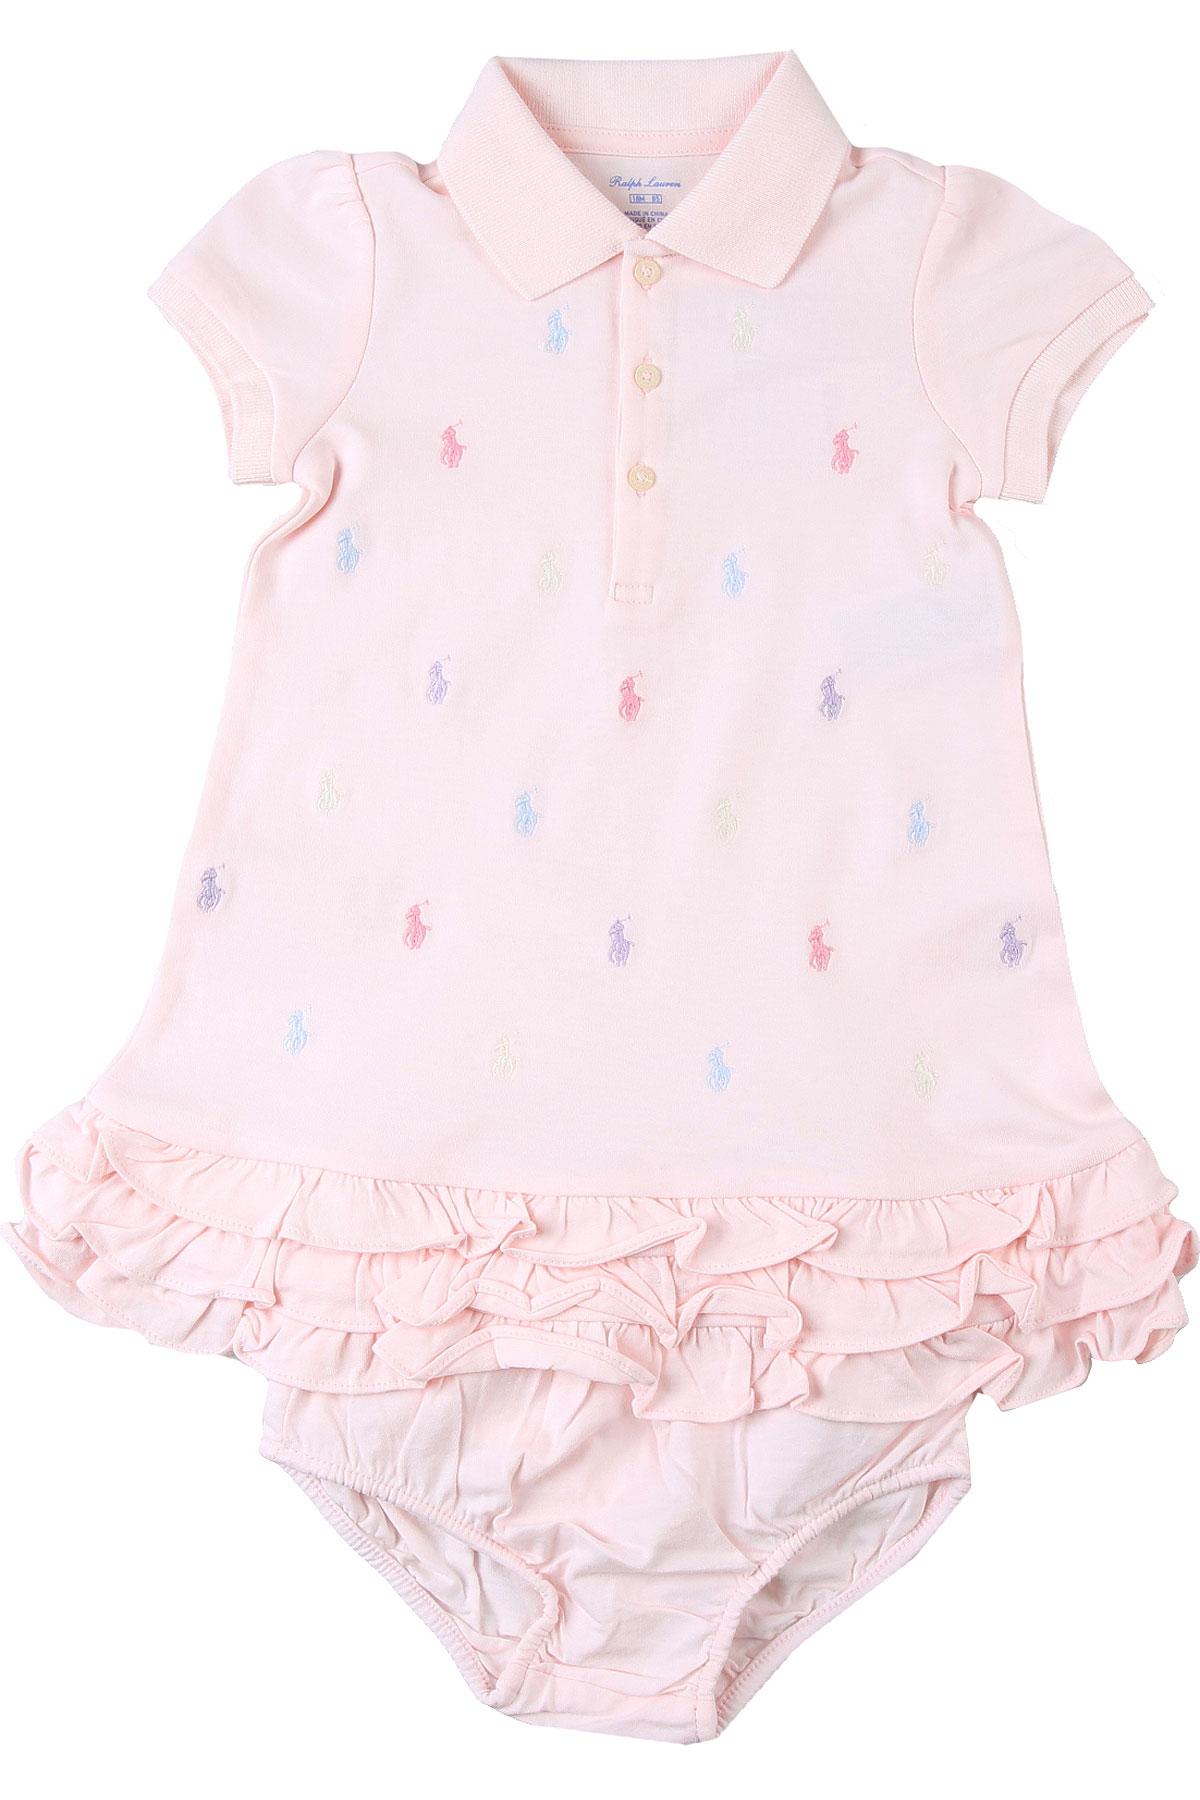 Ralph Lauren Baby Bodysuits & Onesies for Girls On Sale, Pink, Cotton, 2019, 12M 18M 2Y 6M